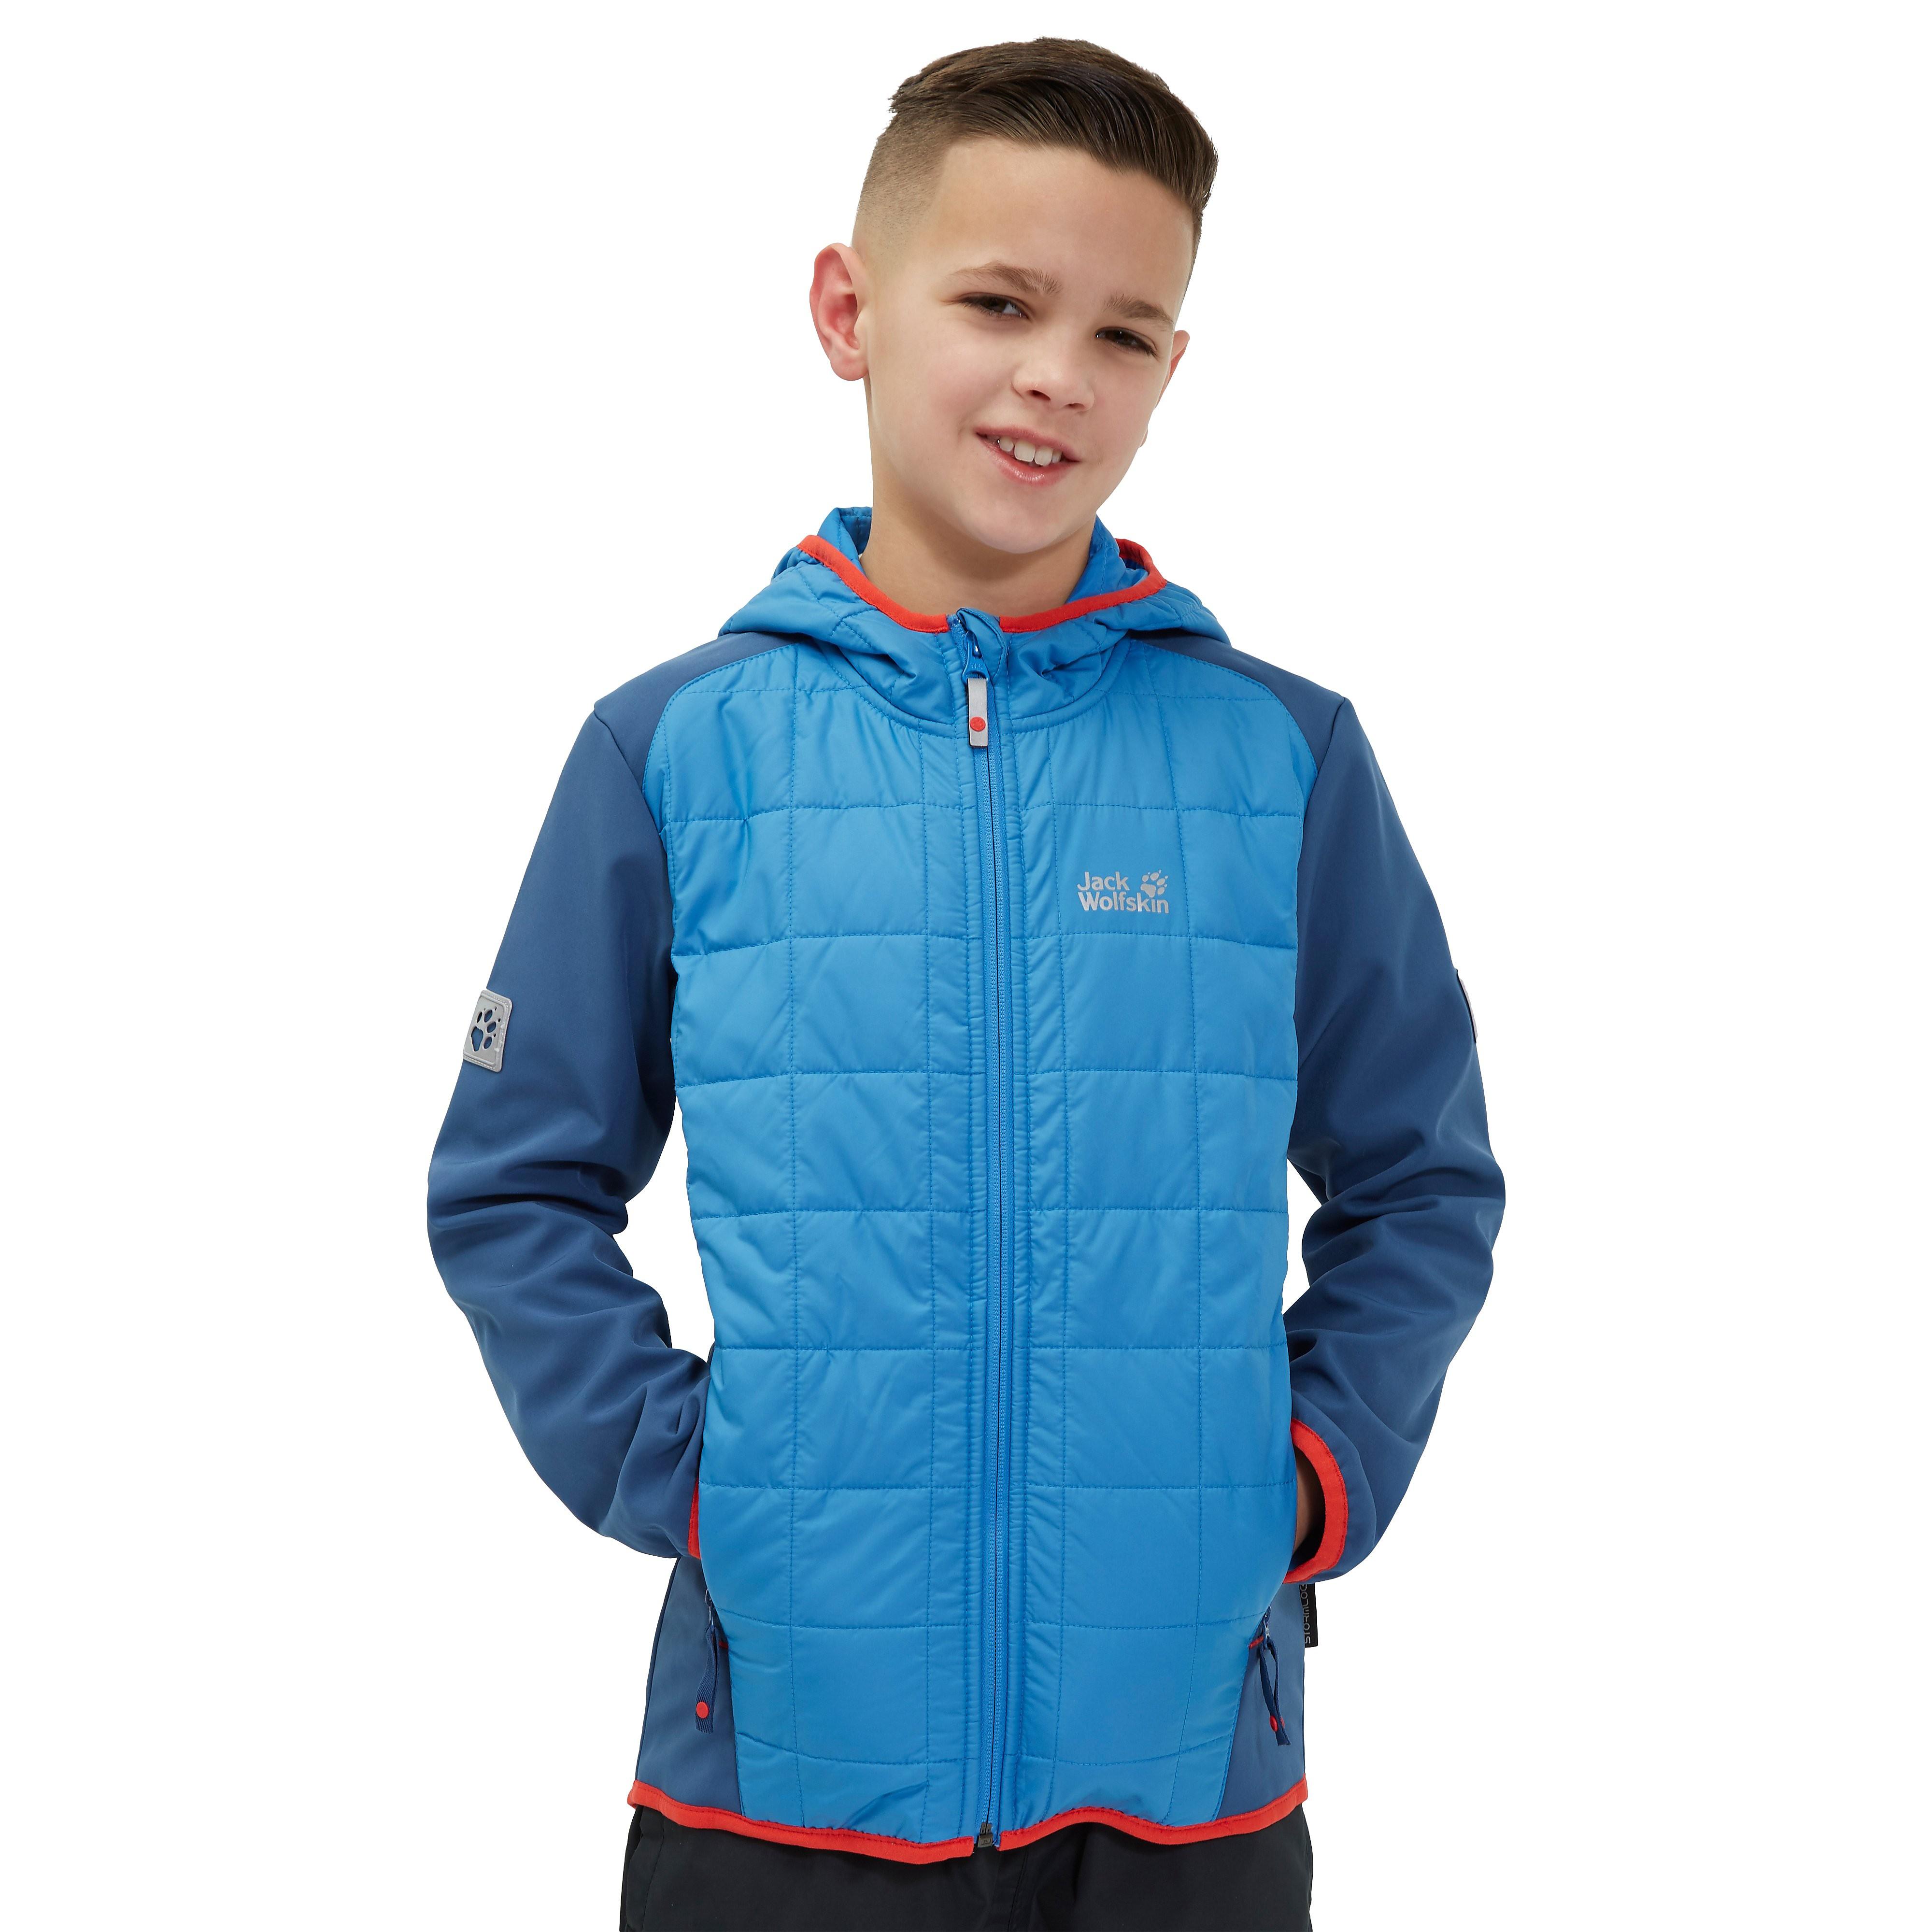 Jack Wolfskin Grassland Hybrid Softshell Junior Jacket